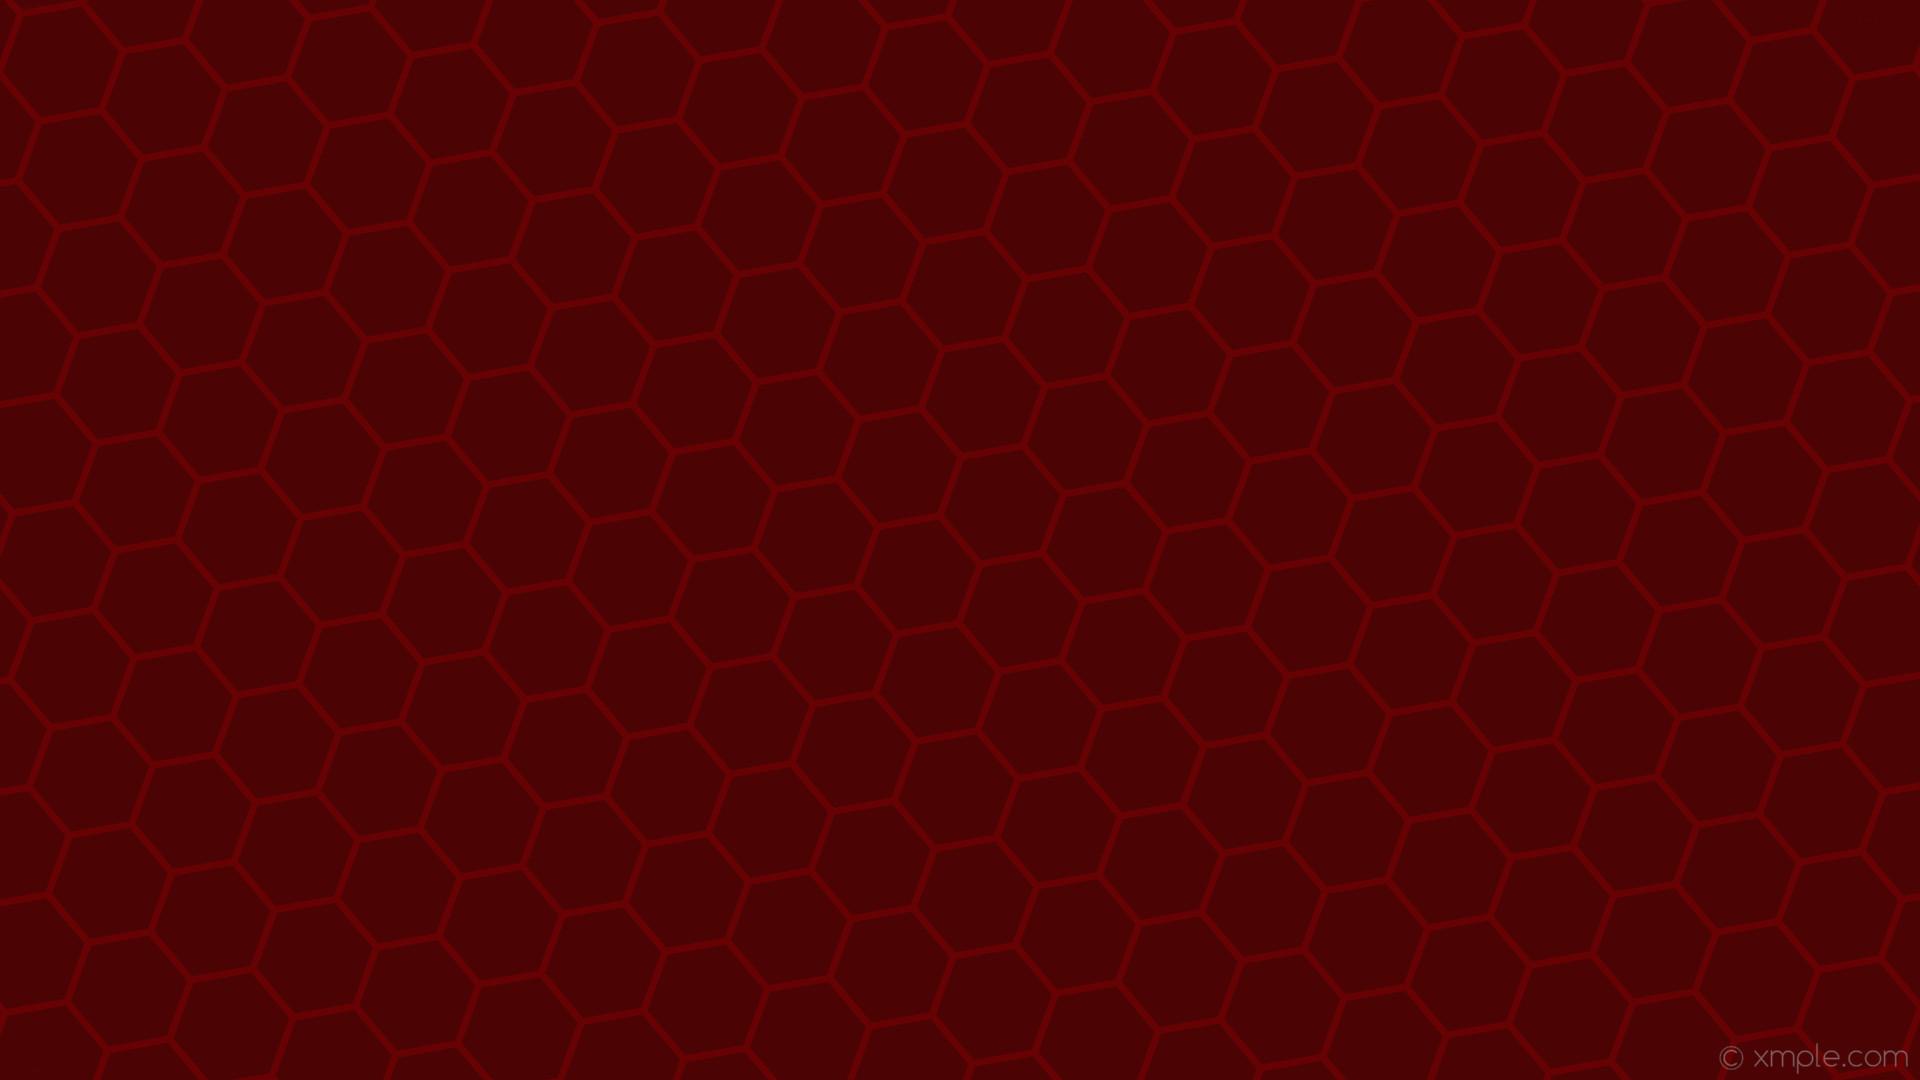 wallpaper honeycomb hexagon beehive red dark red #4b0304 #660203 diagonal  40° 7px 109px